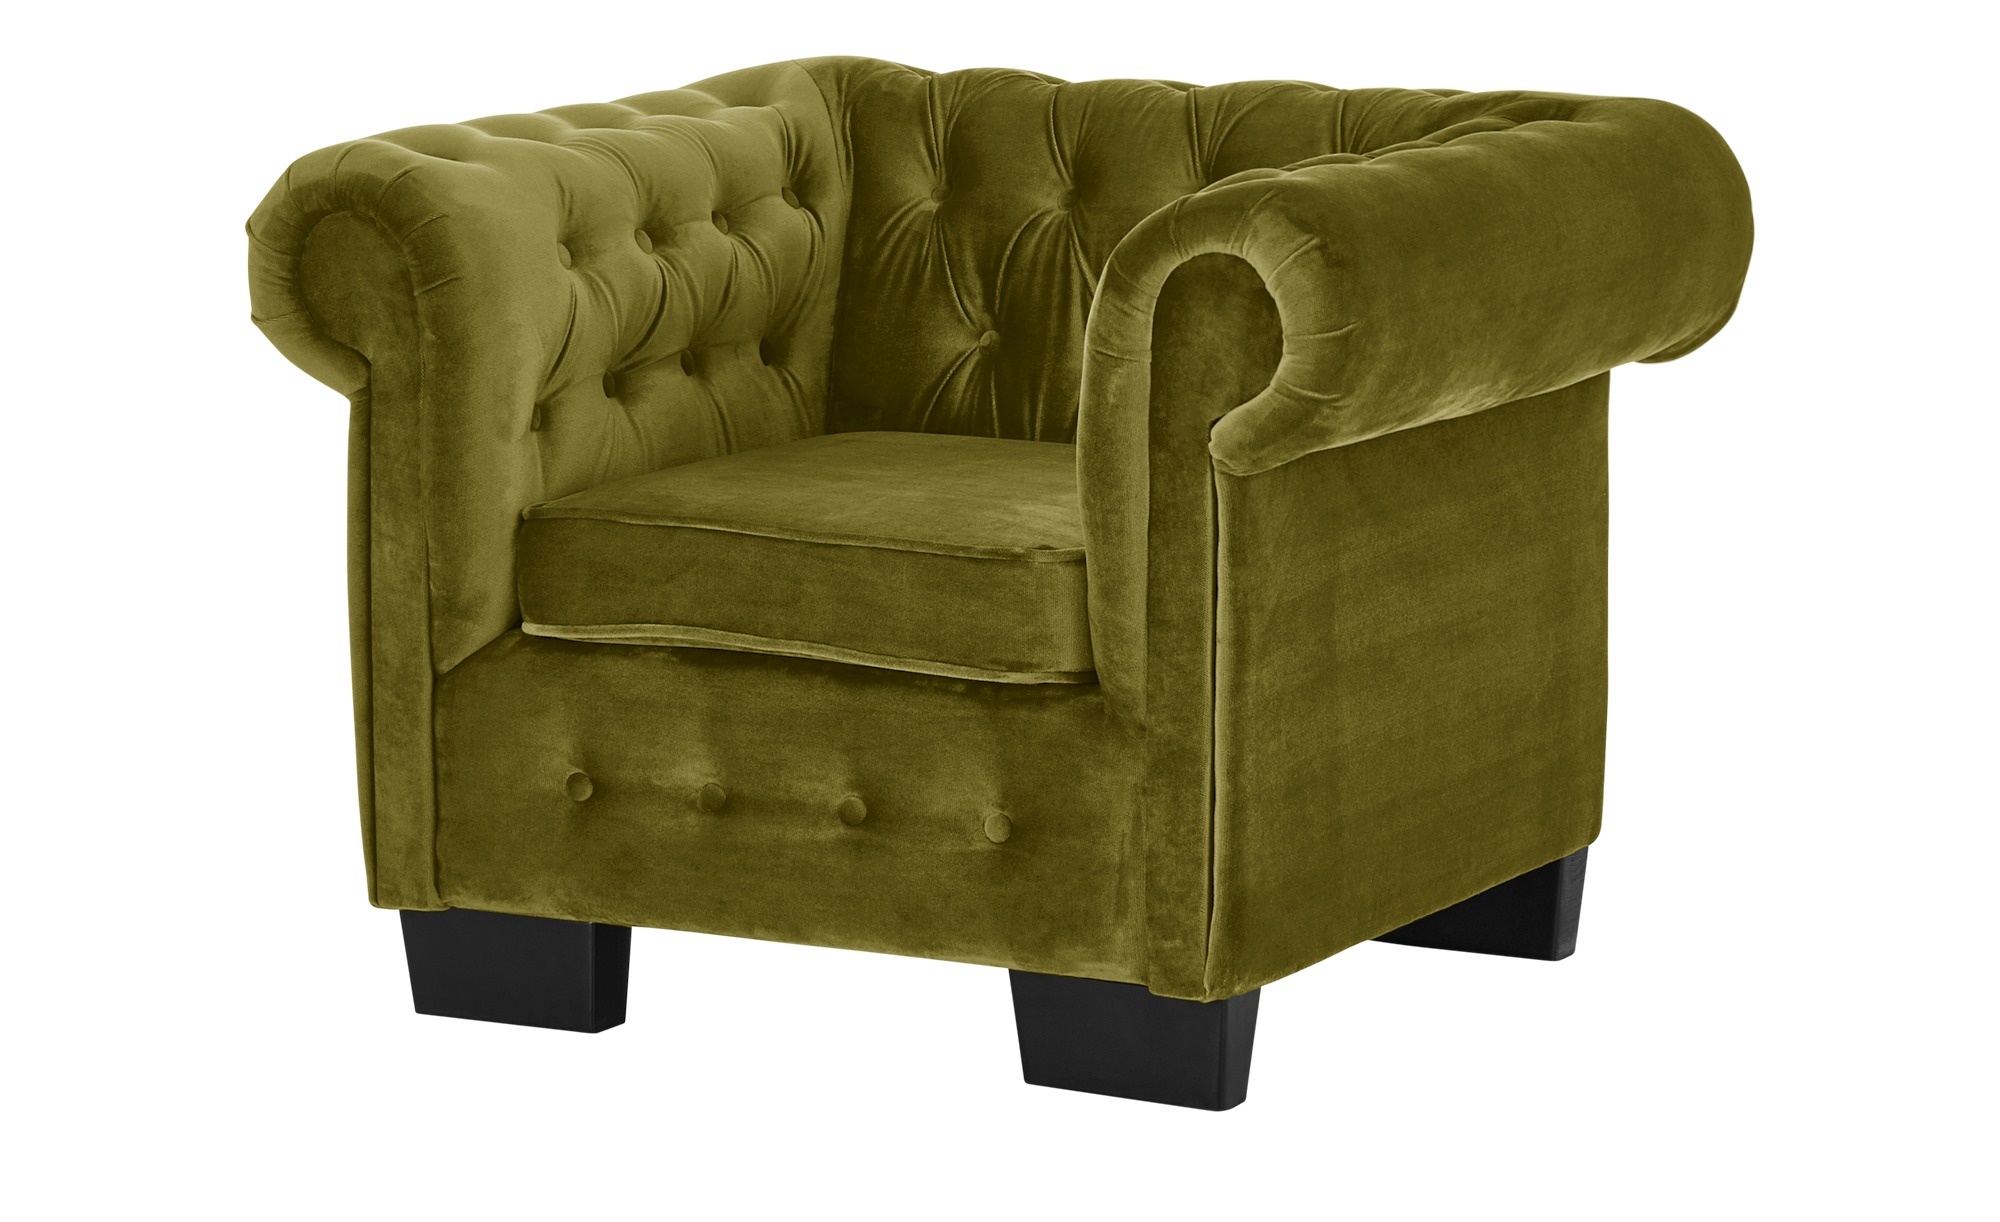 smart Sessel  Chelli ¦ grün ¦ Maße (cm): B: 102 H: 75 T: 89 Polstermöbel > Sessel > Polstersessel - Höffner